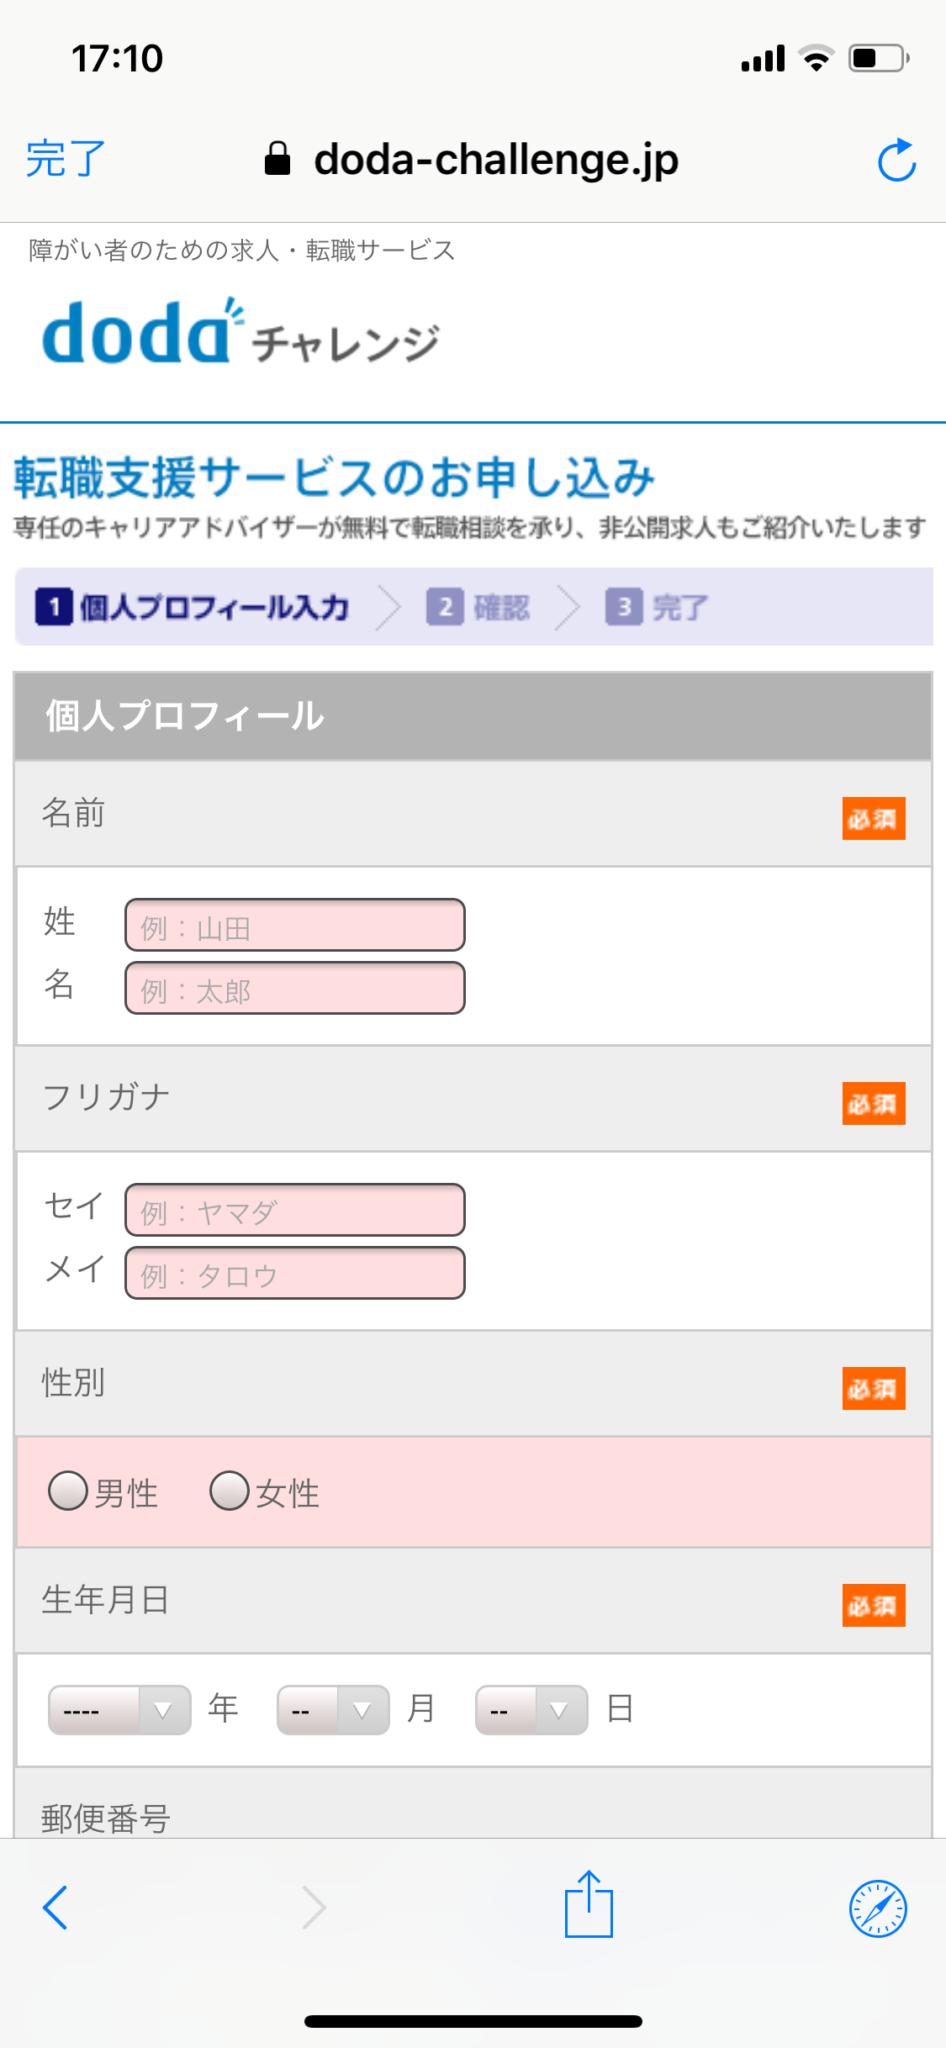 dodaチャレンジ 情報入力画面